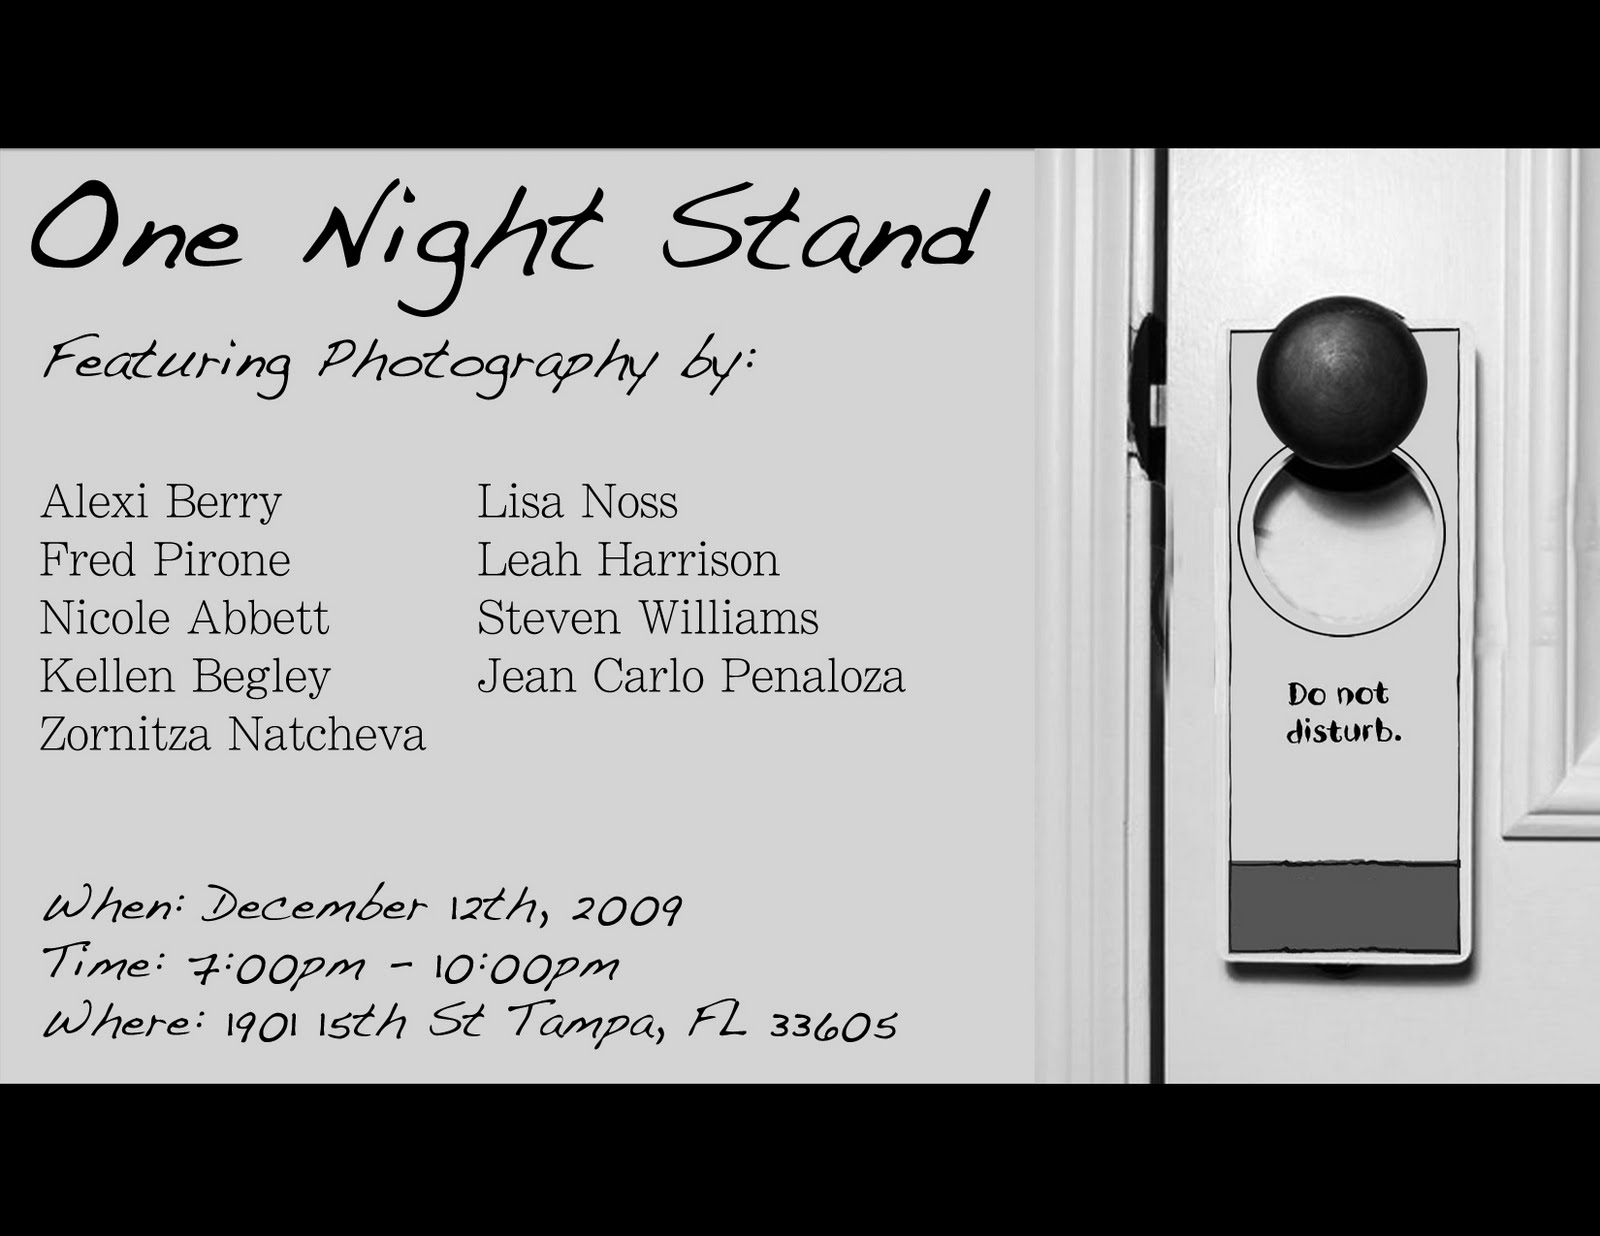 One night stand tampa